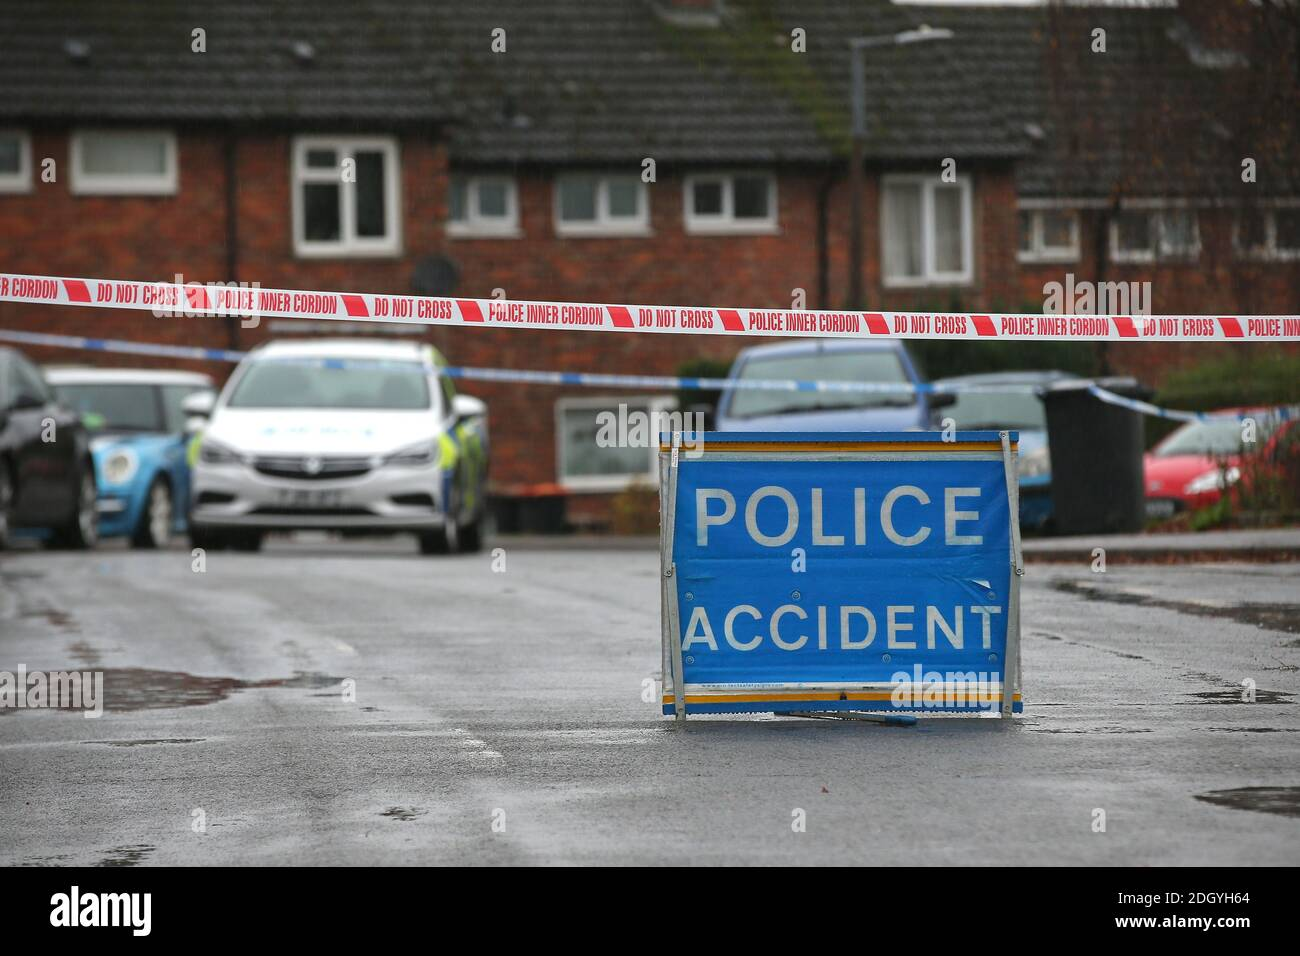 Police Accident Sign, Nottingham, Thursday 3rd December 2020. Stock Photo